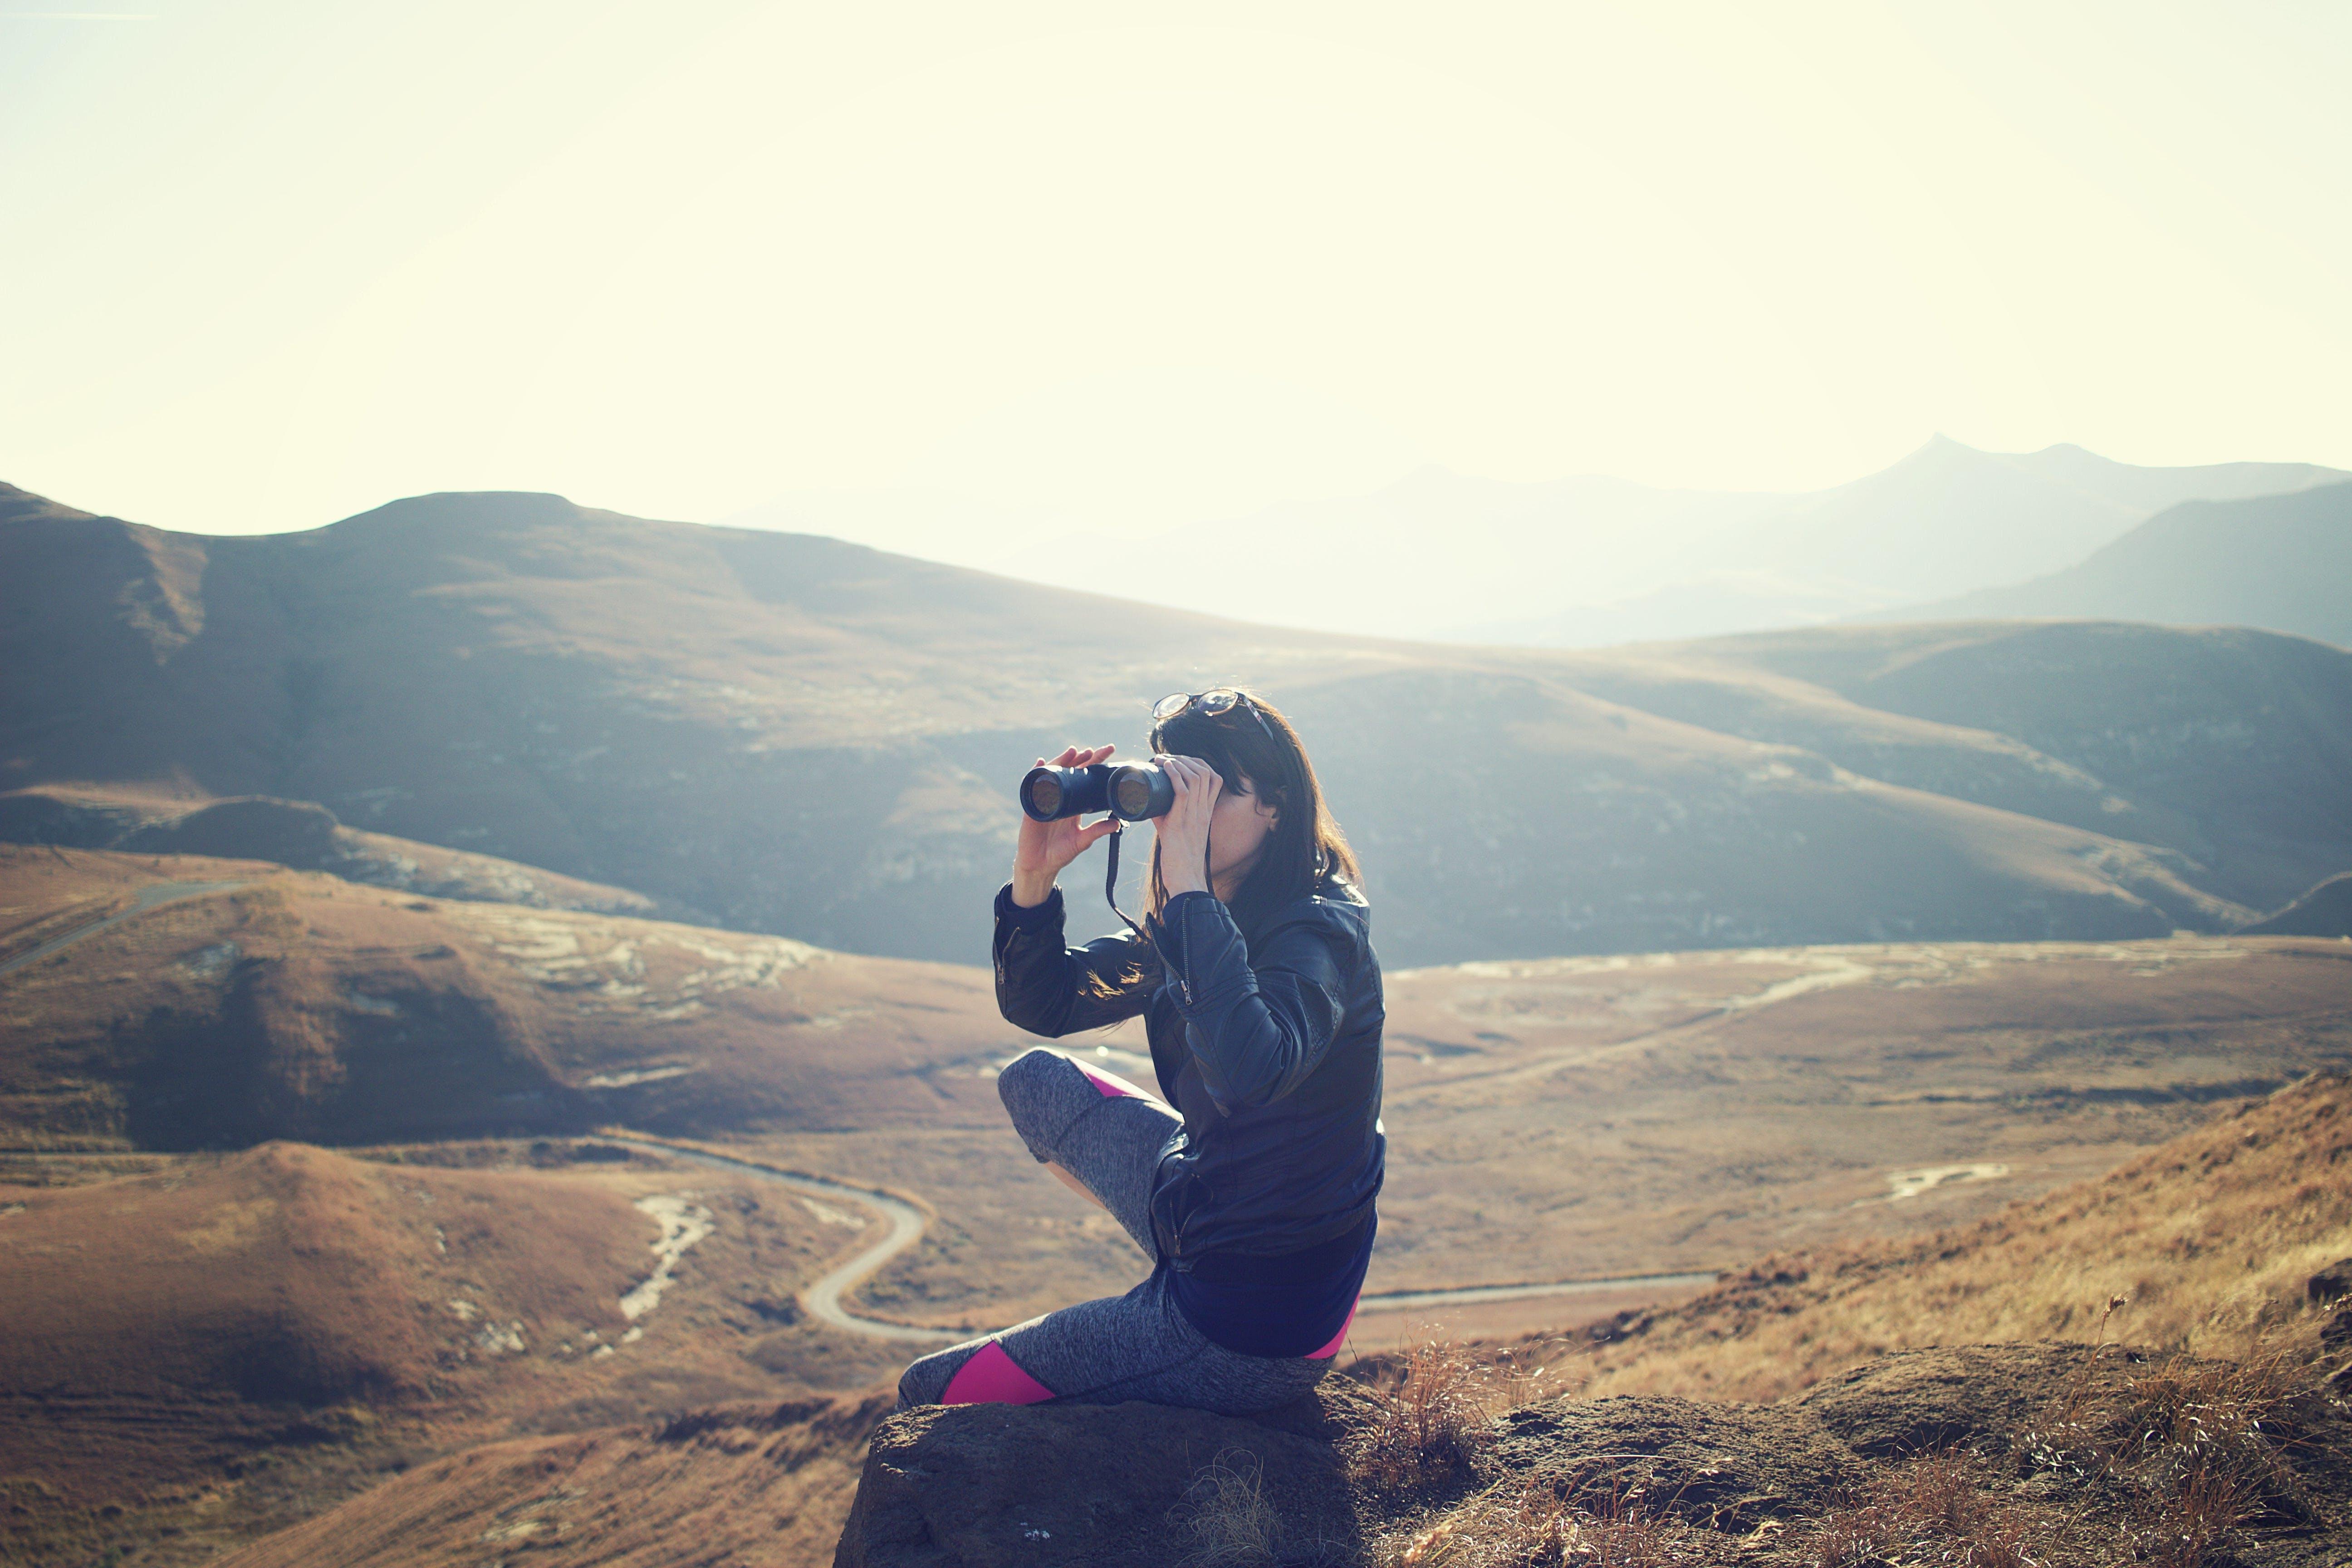 Titelbild-Success-Story-Noblex-Fernglas-Fernrohr-Gebirge-Berge-pixabay-1846437-Pexels